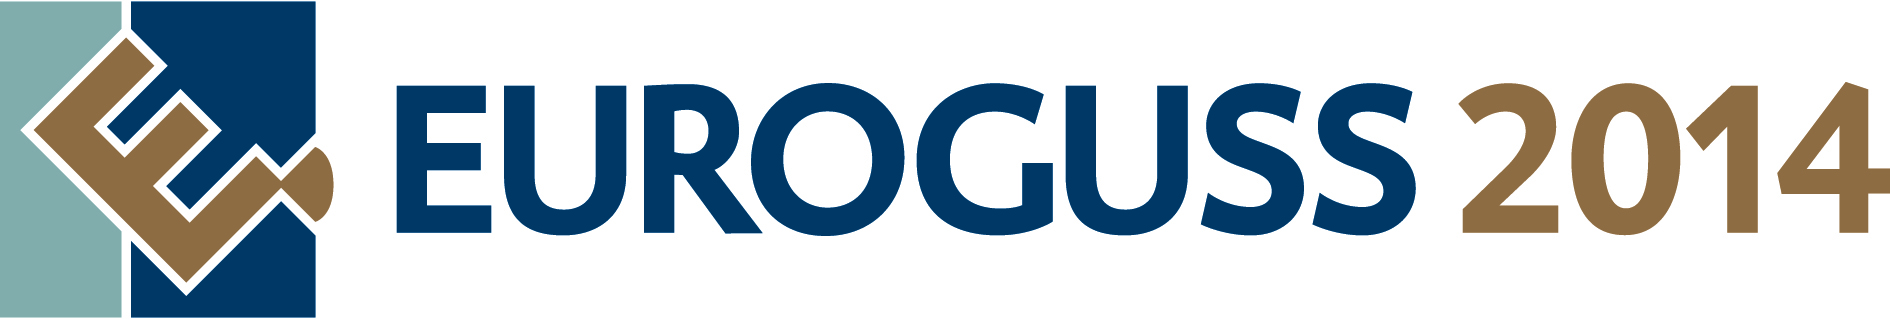 logoeuroguss2014